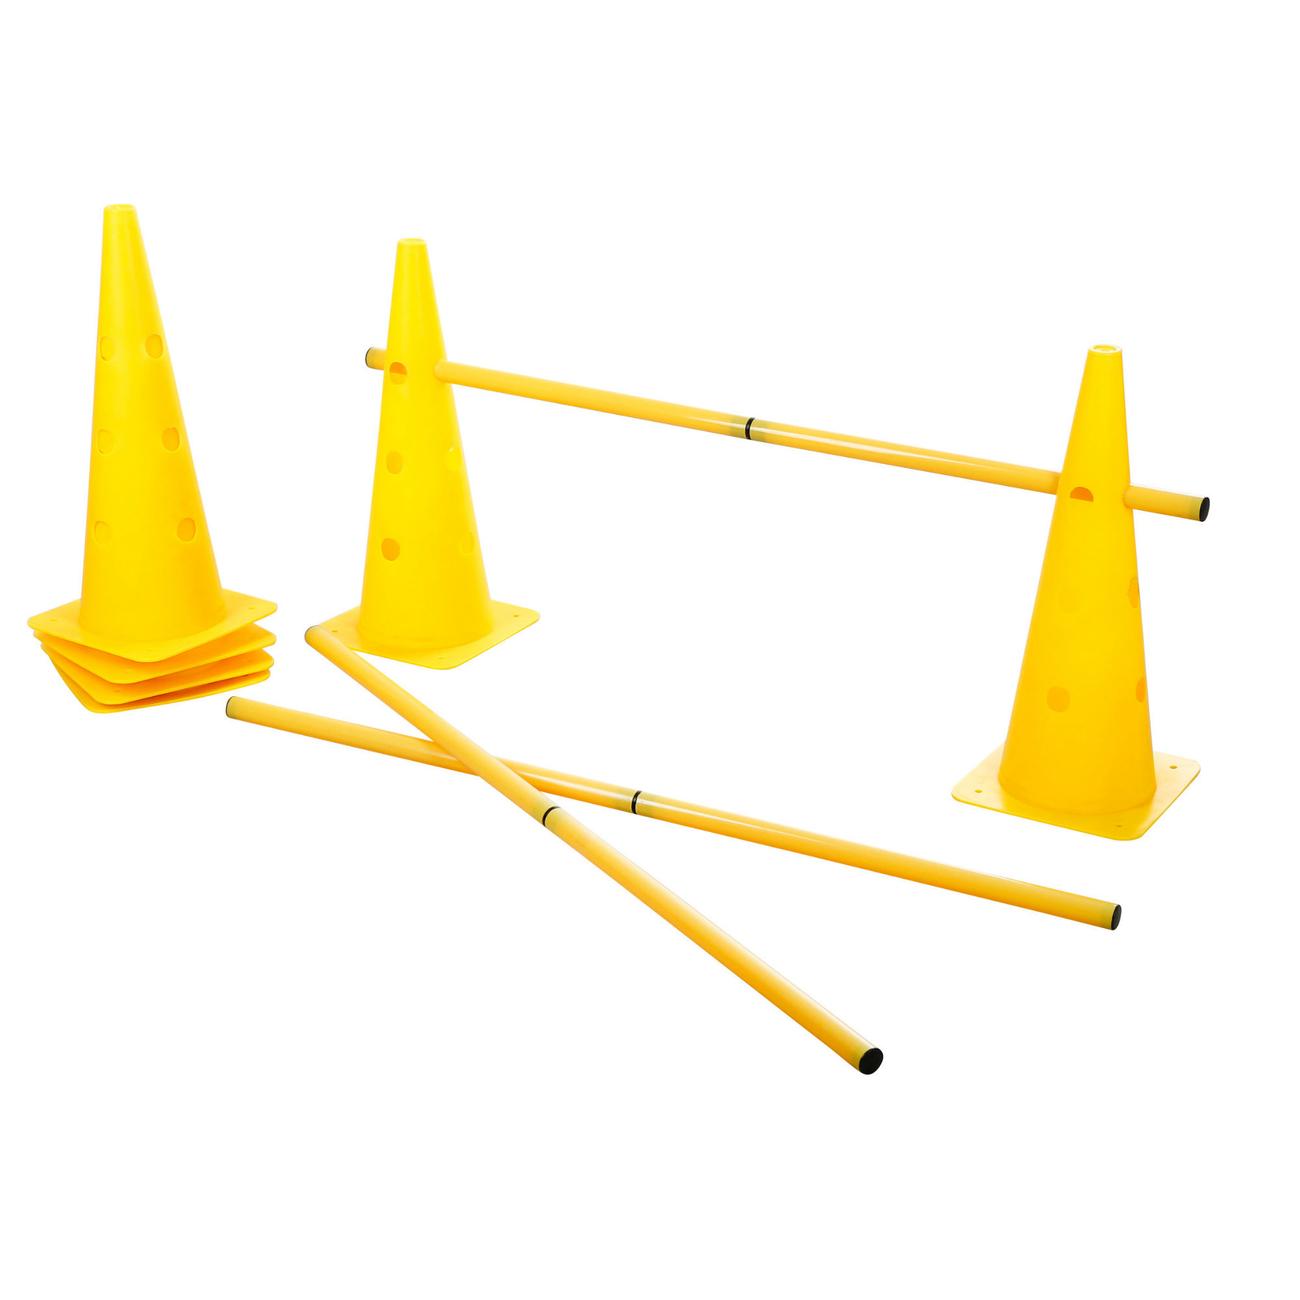 Kerbl Agility Pylonen-Hürden Set für Hunde, gelb, 3 Hürden, 6 Pylonen